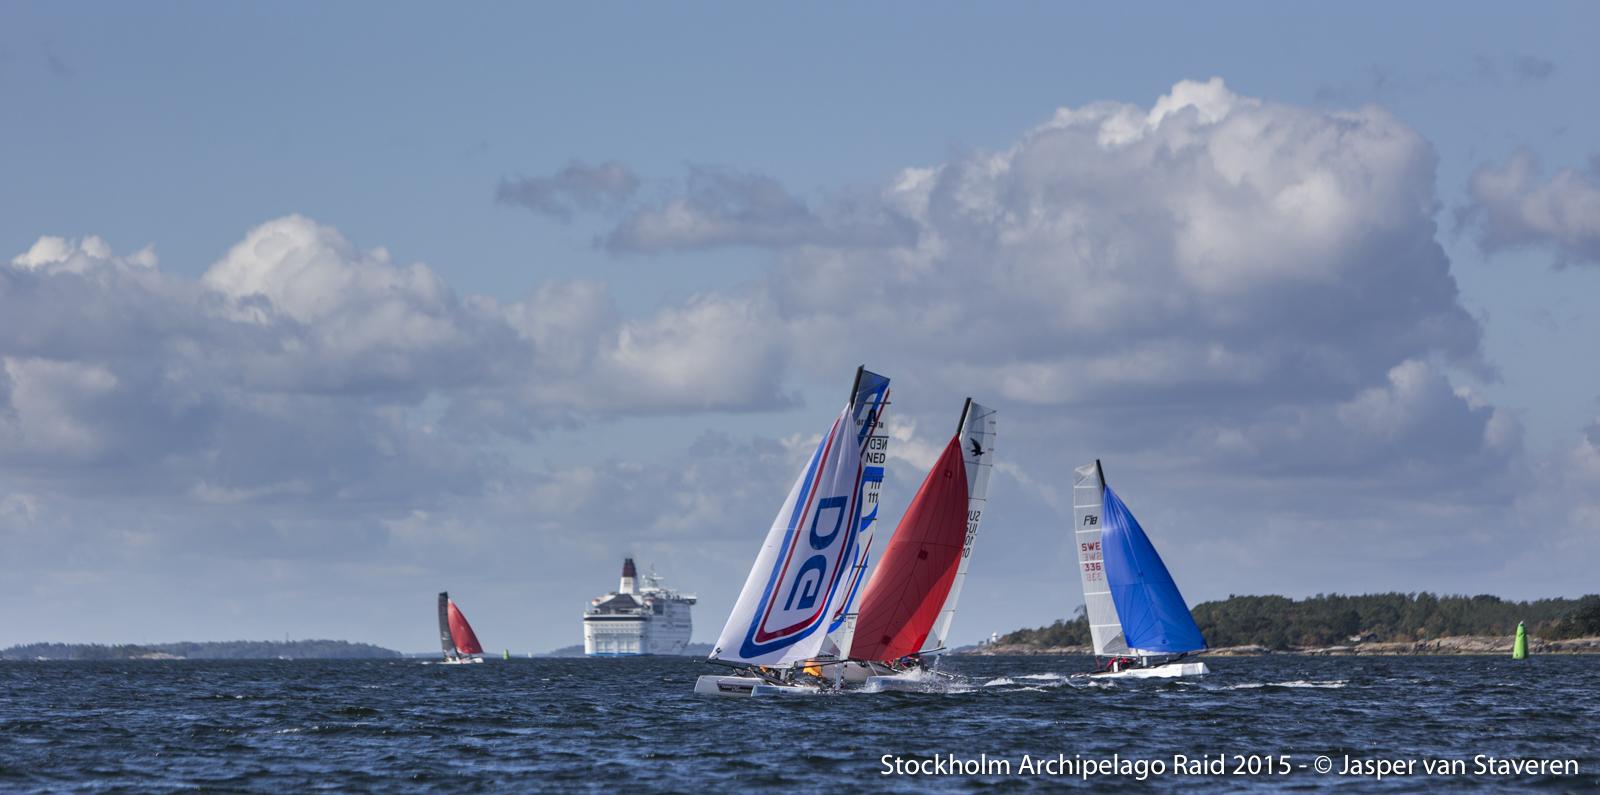 Stockholm Archipelago Raid 2015-5226